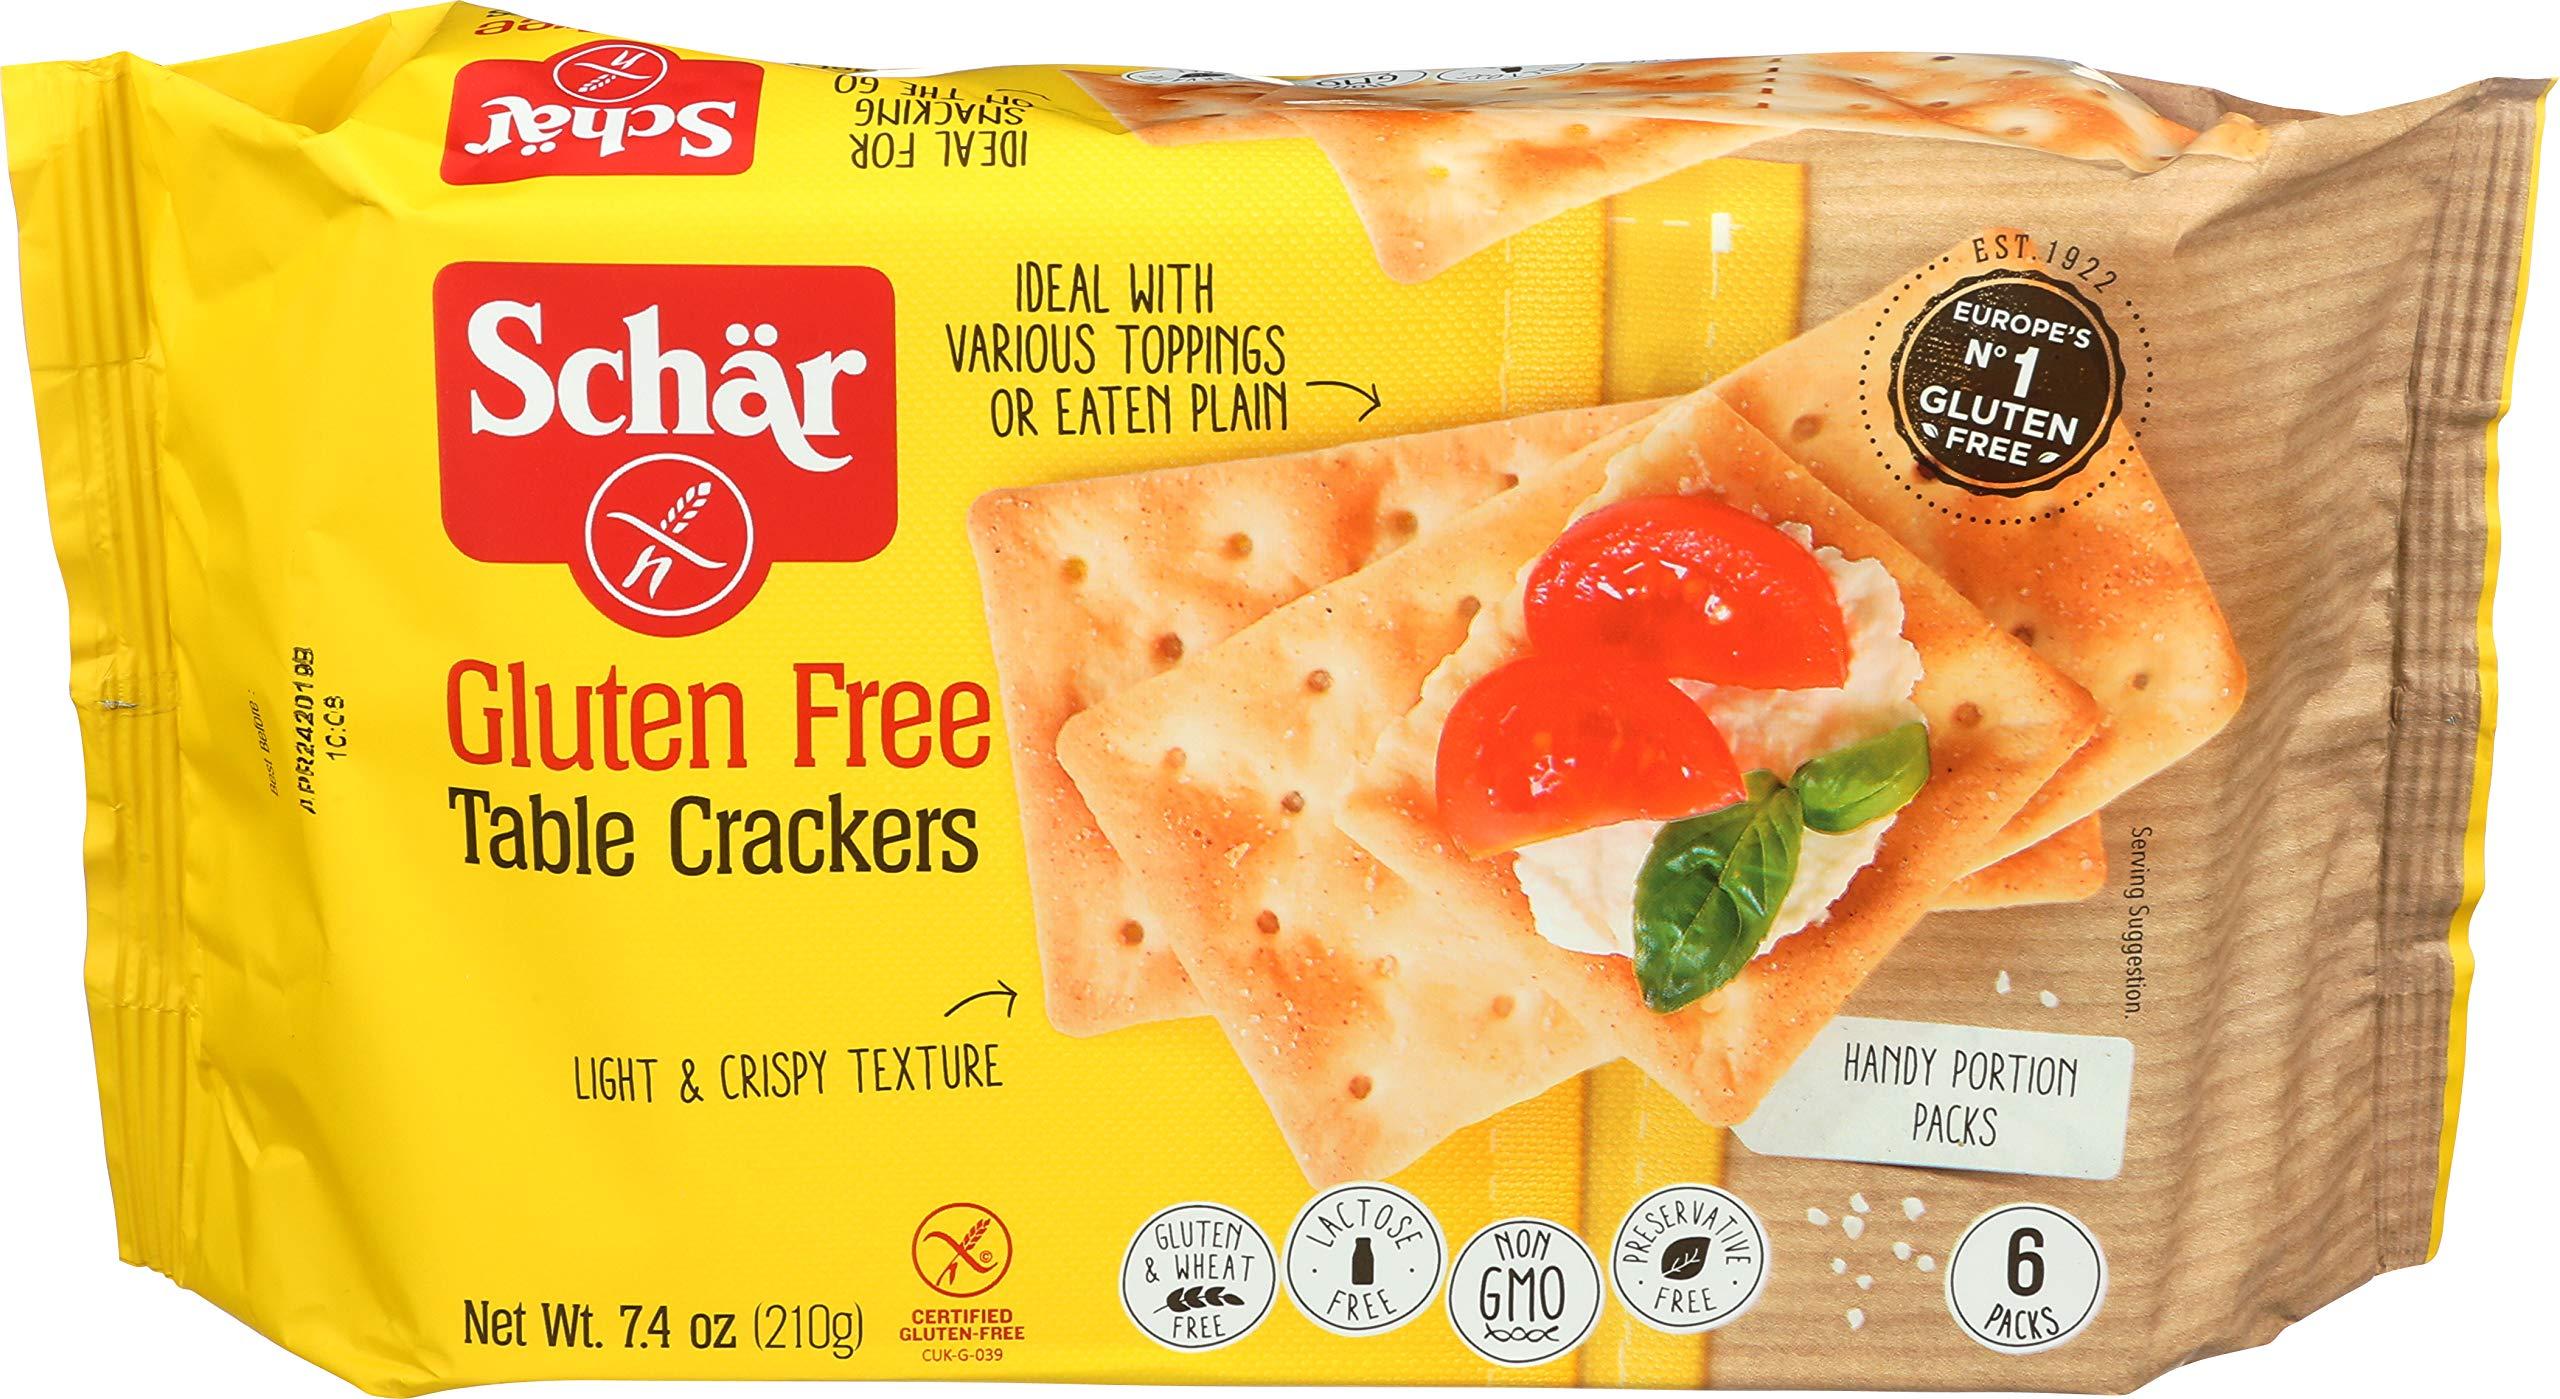 Schär Gluten Free Table Crackers, 7.4 oz., 6-Pack by Schar